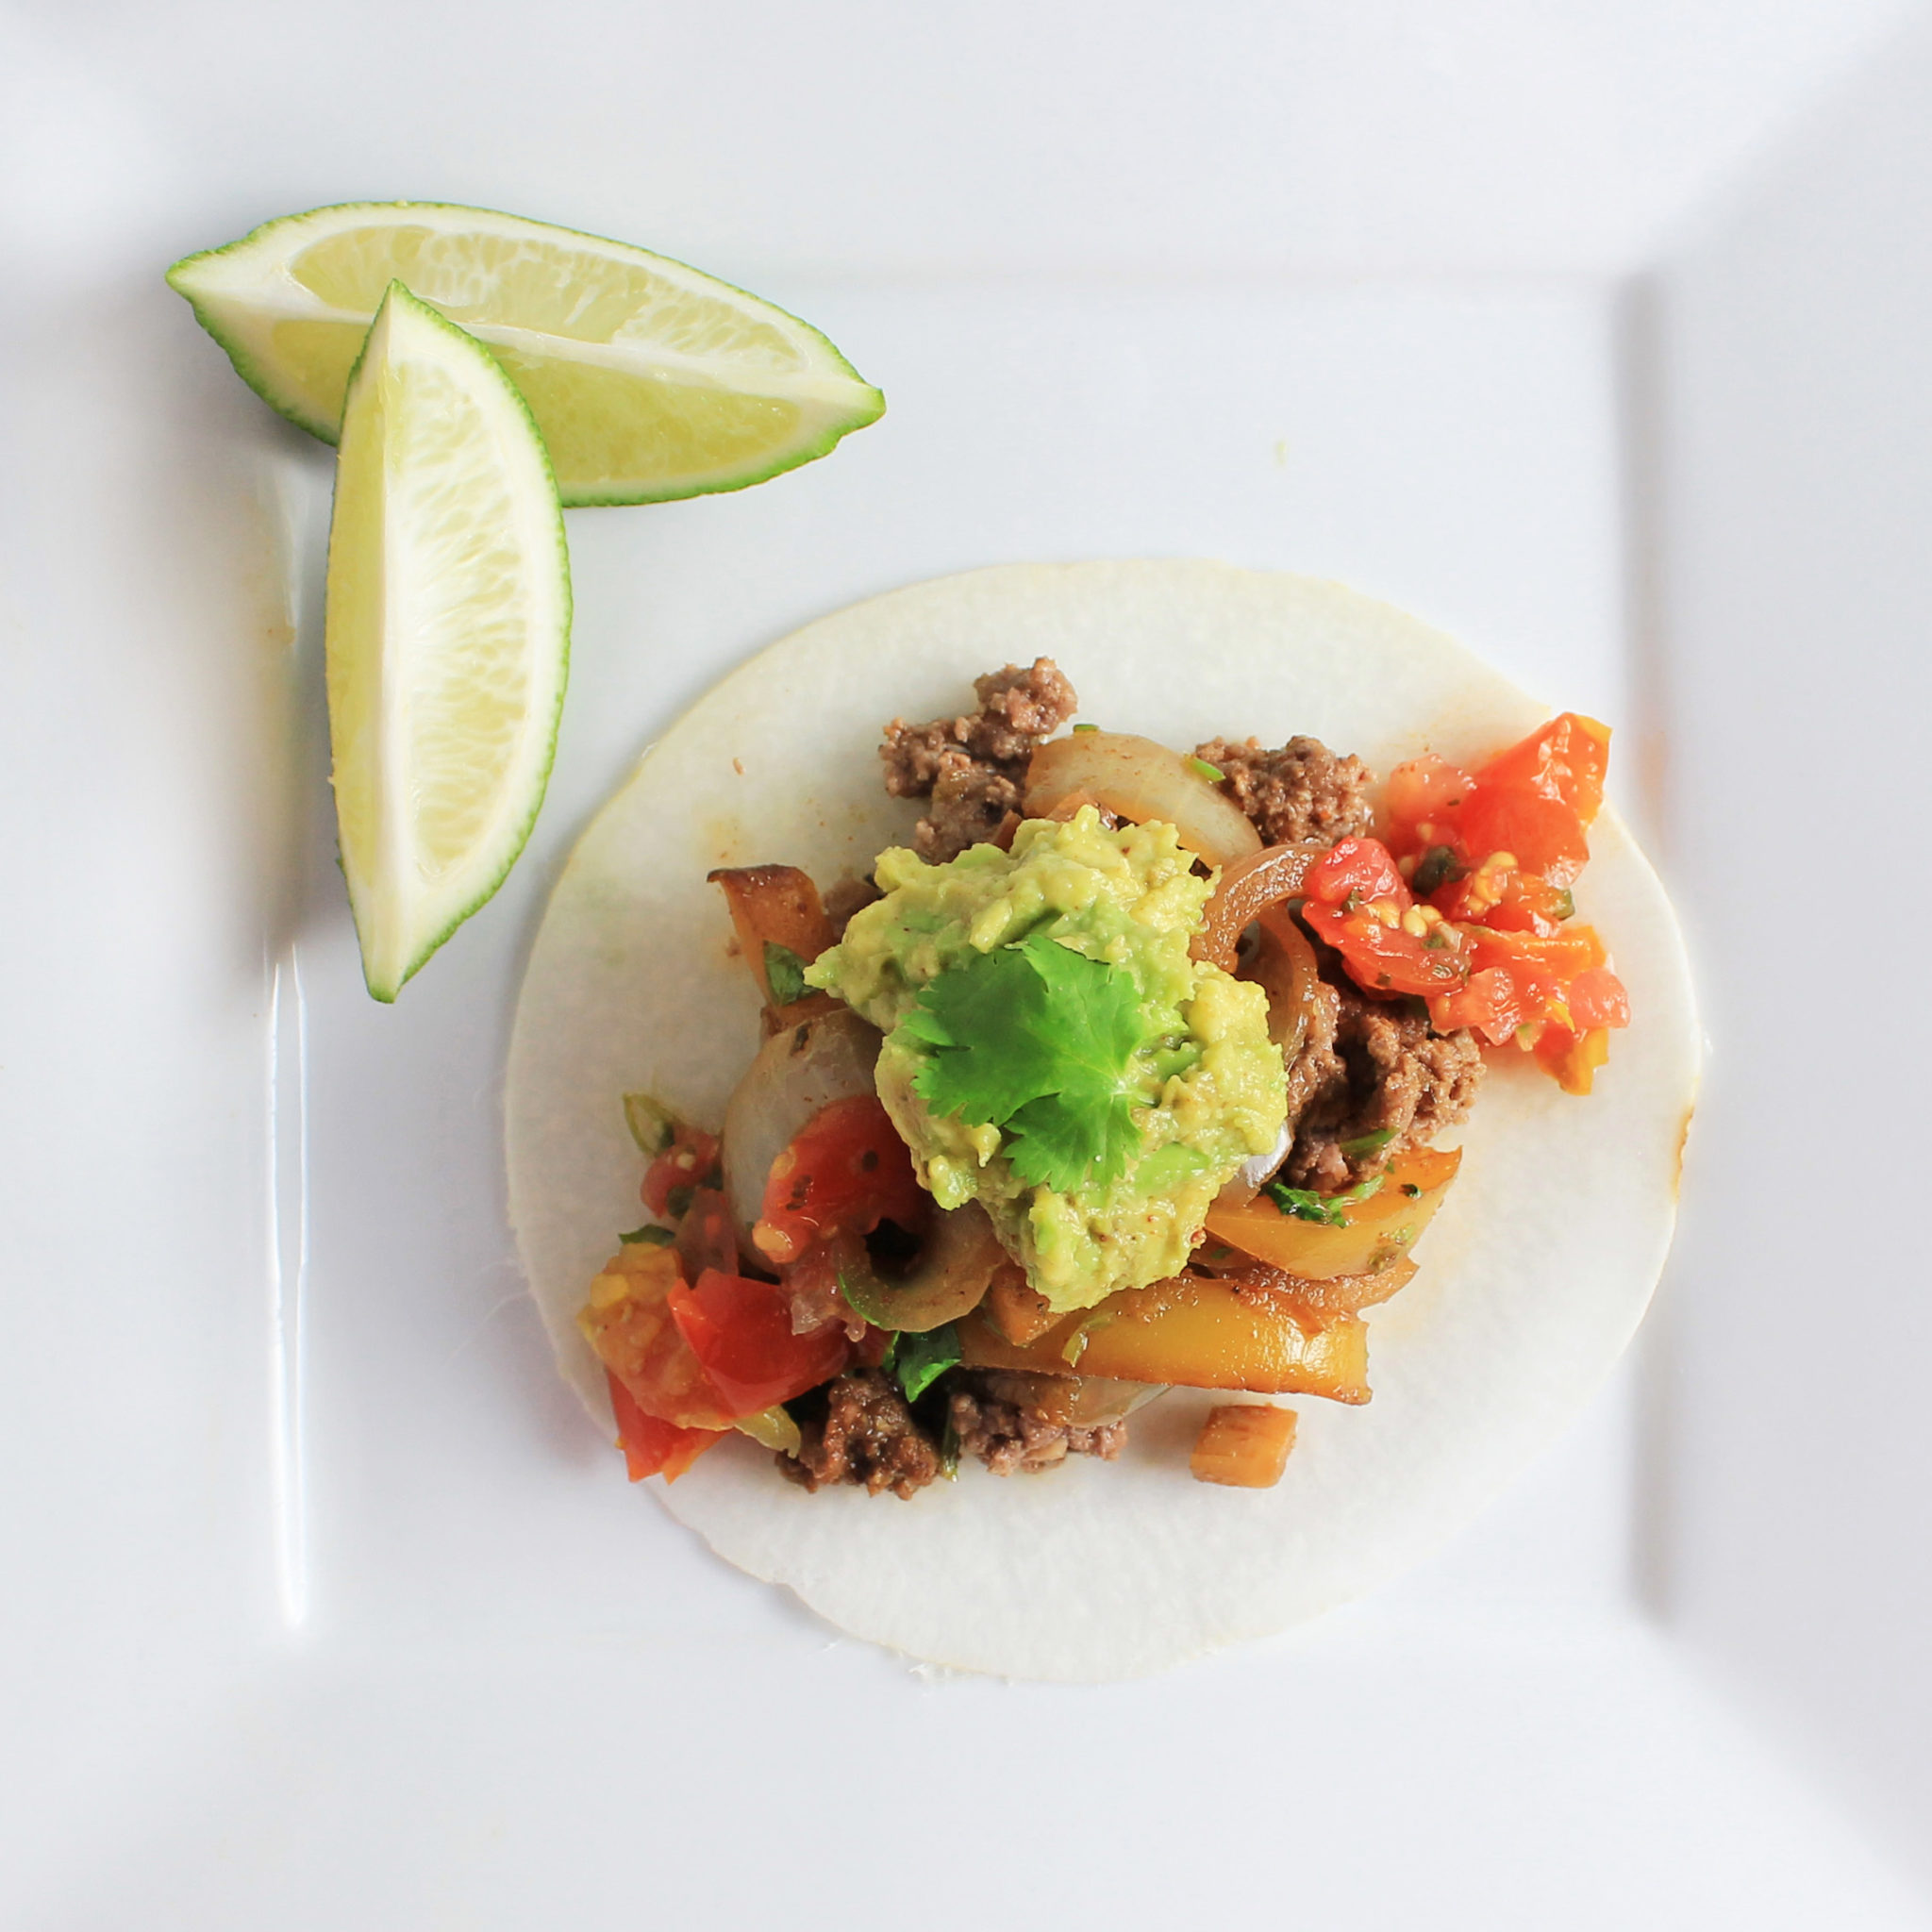 jicama taco shells